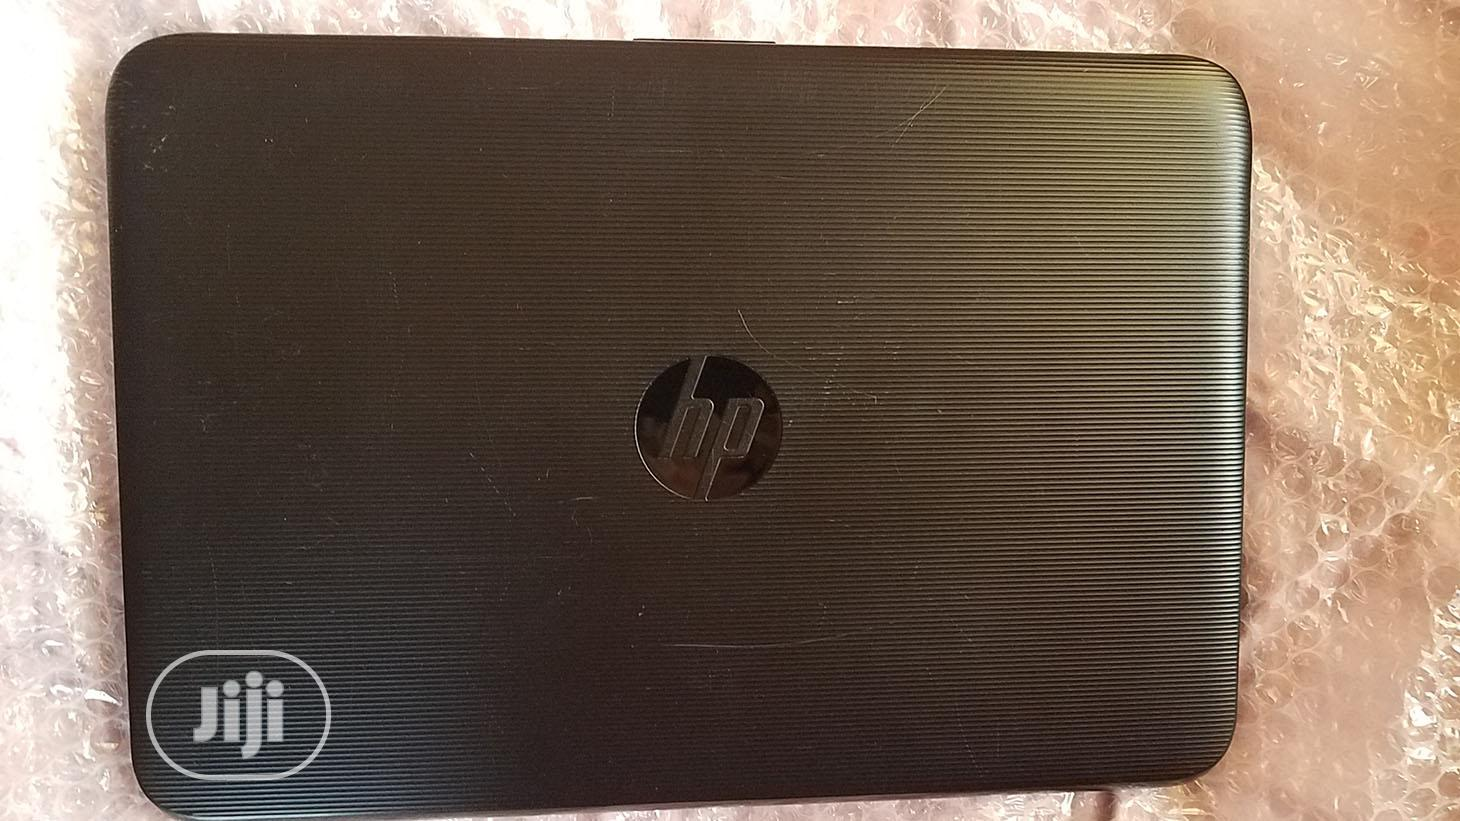 Laptop HP Stream 11 Pro G3 4GB Intel Celeron SSD 60GB | Laptops & Computers for sale in Kubwa, Abuja (FCT) State, Nigeria